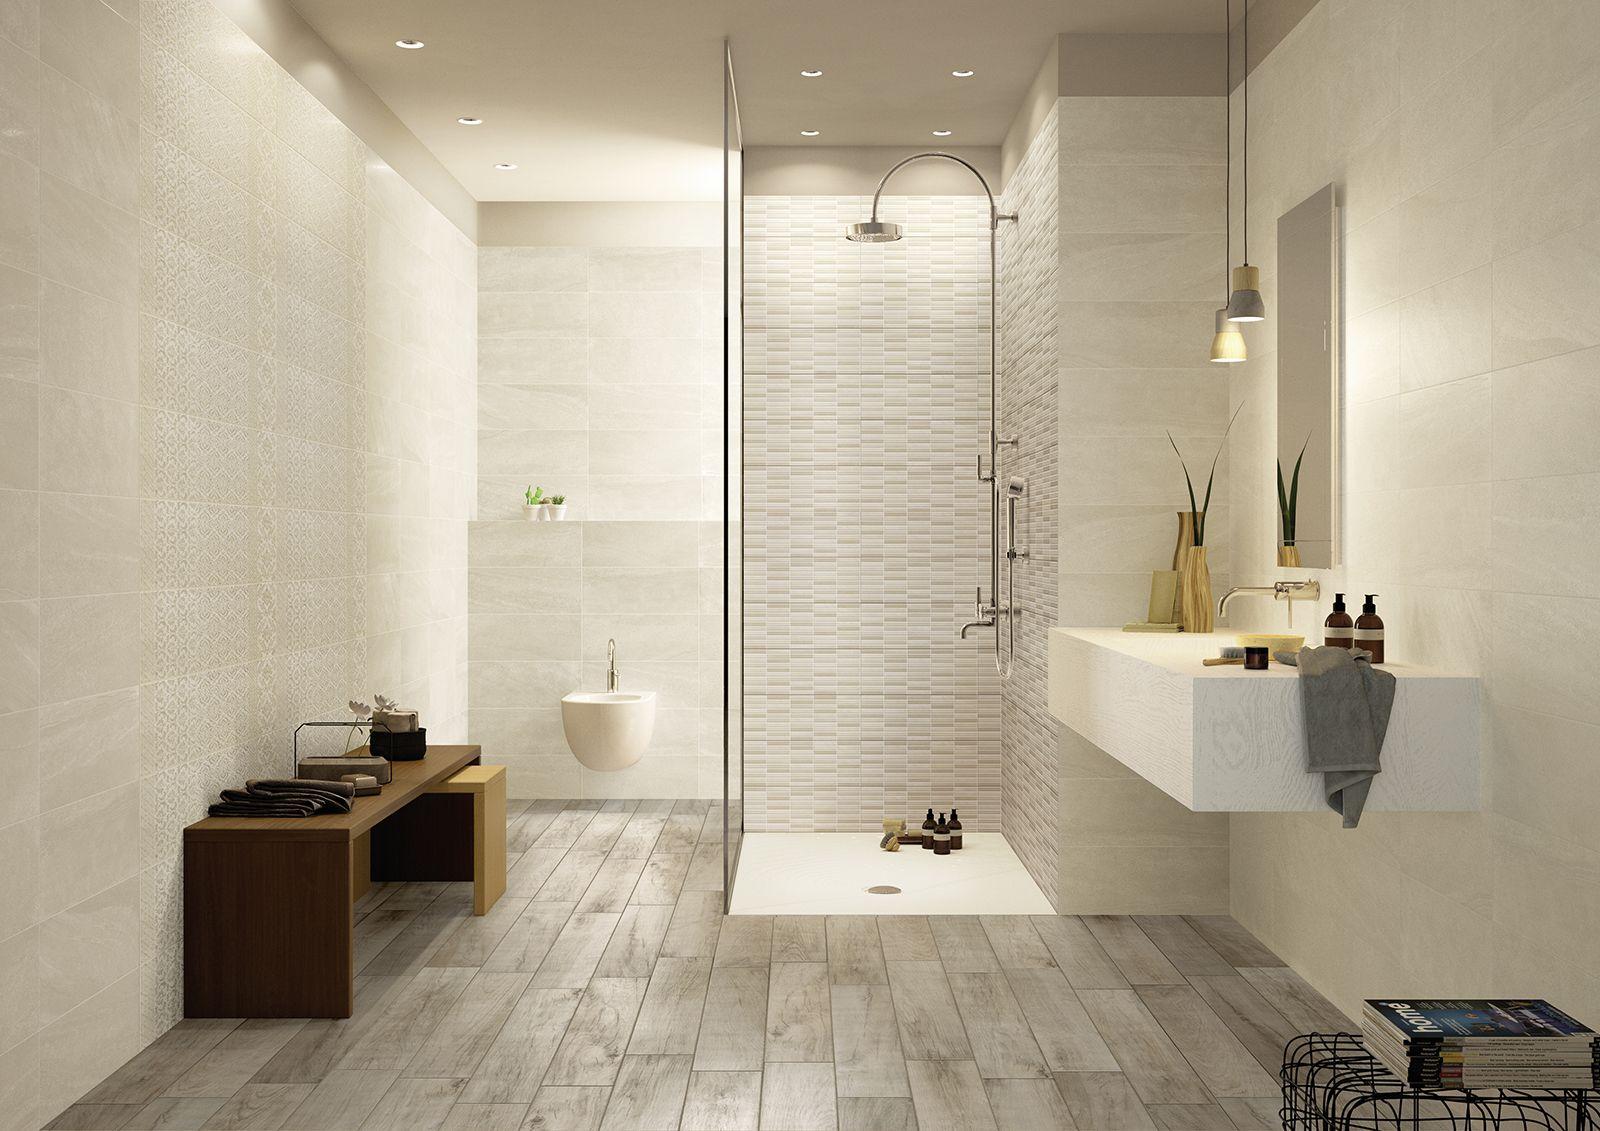 Interiors – ceramic bathroom and kitchen wall tiles | Marazzi ...